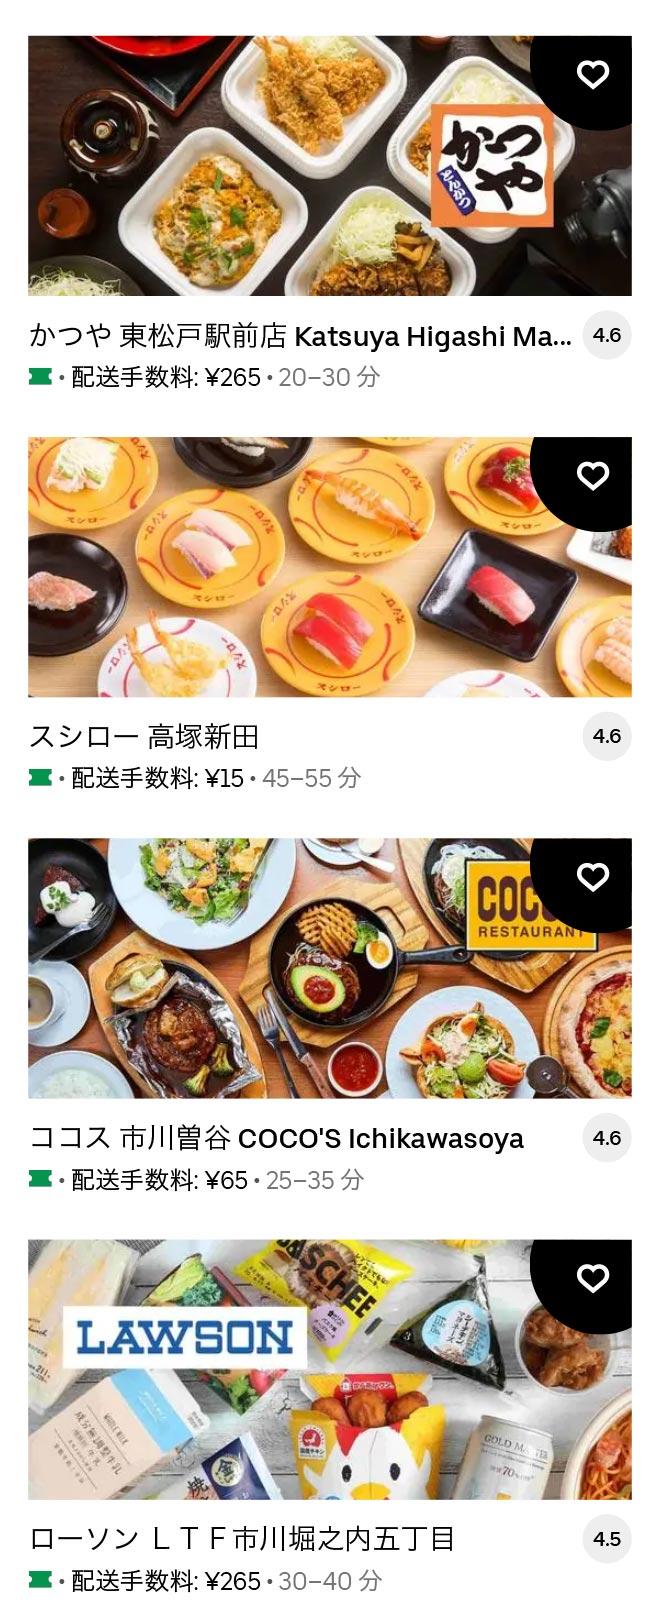 U ichikawa oono 2105 03